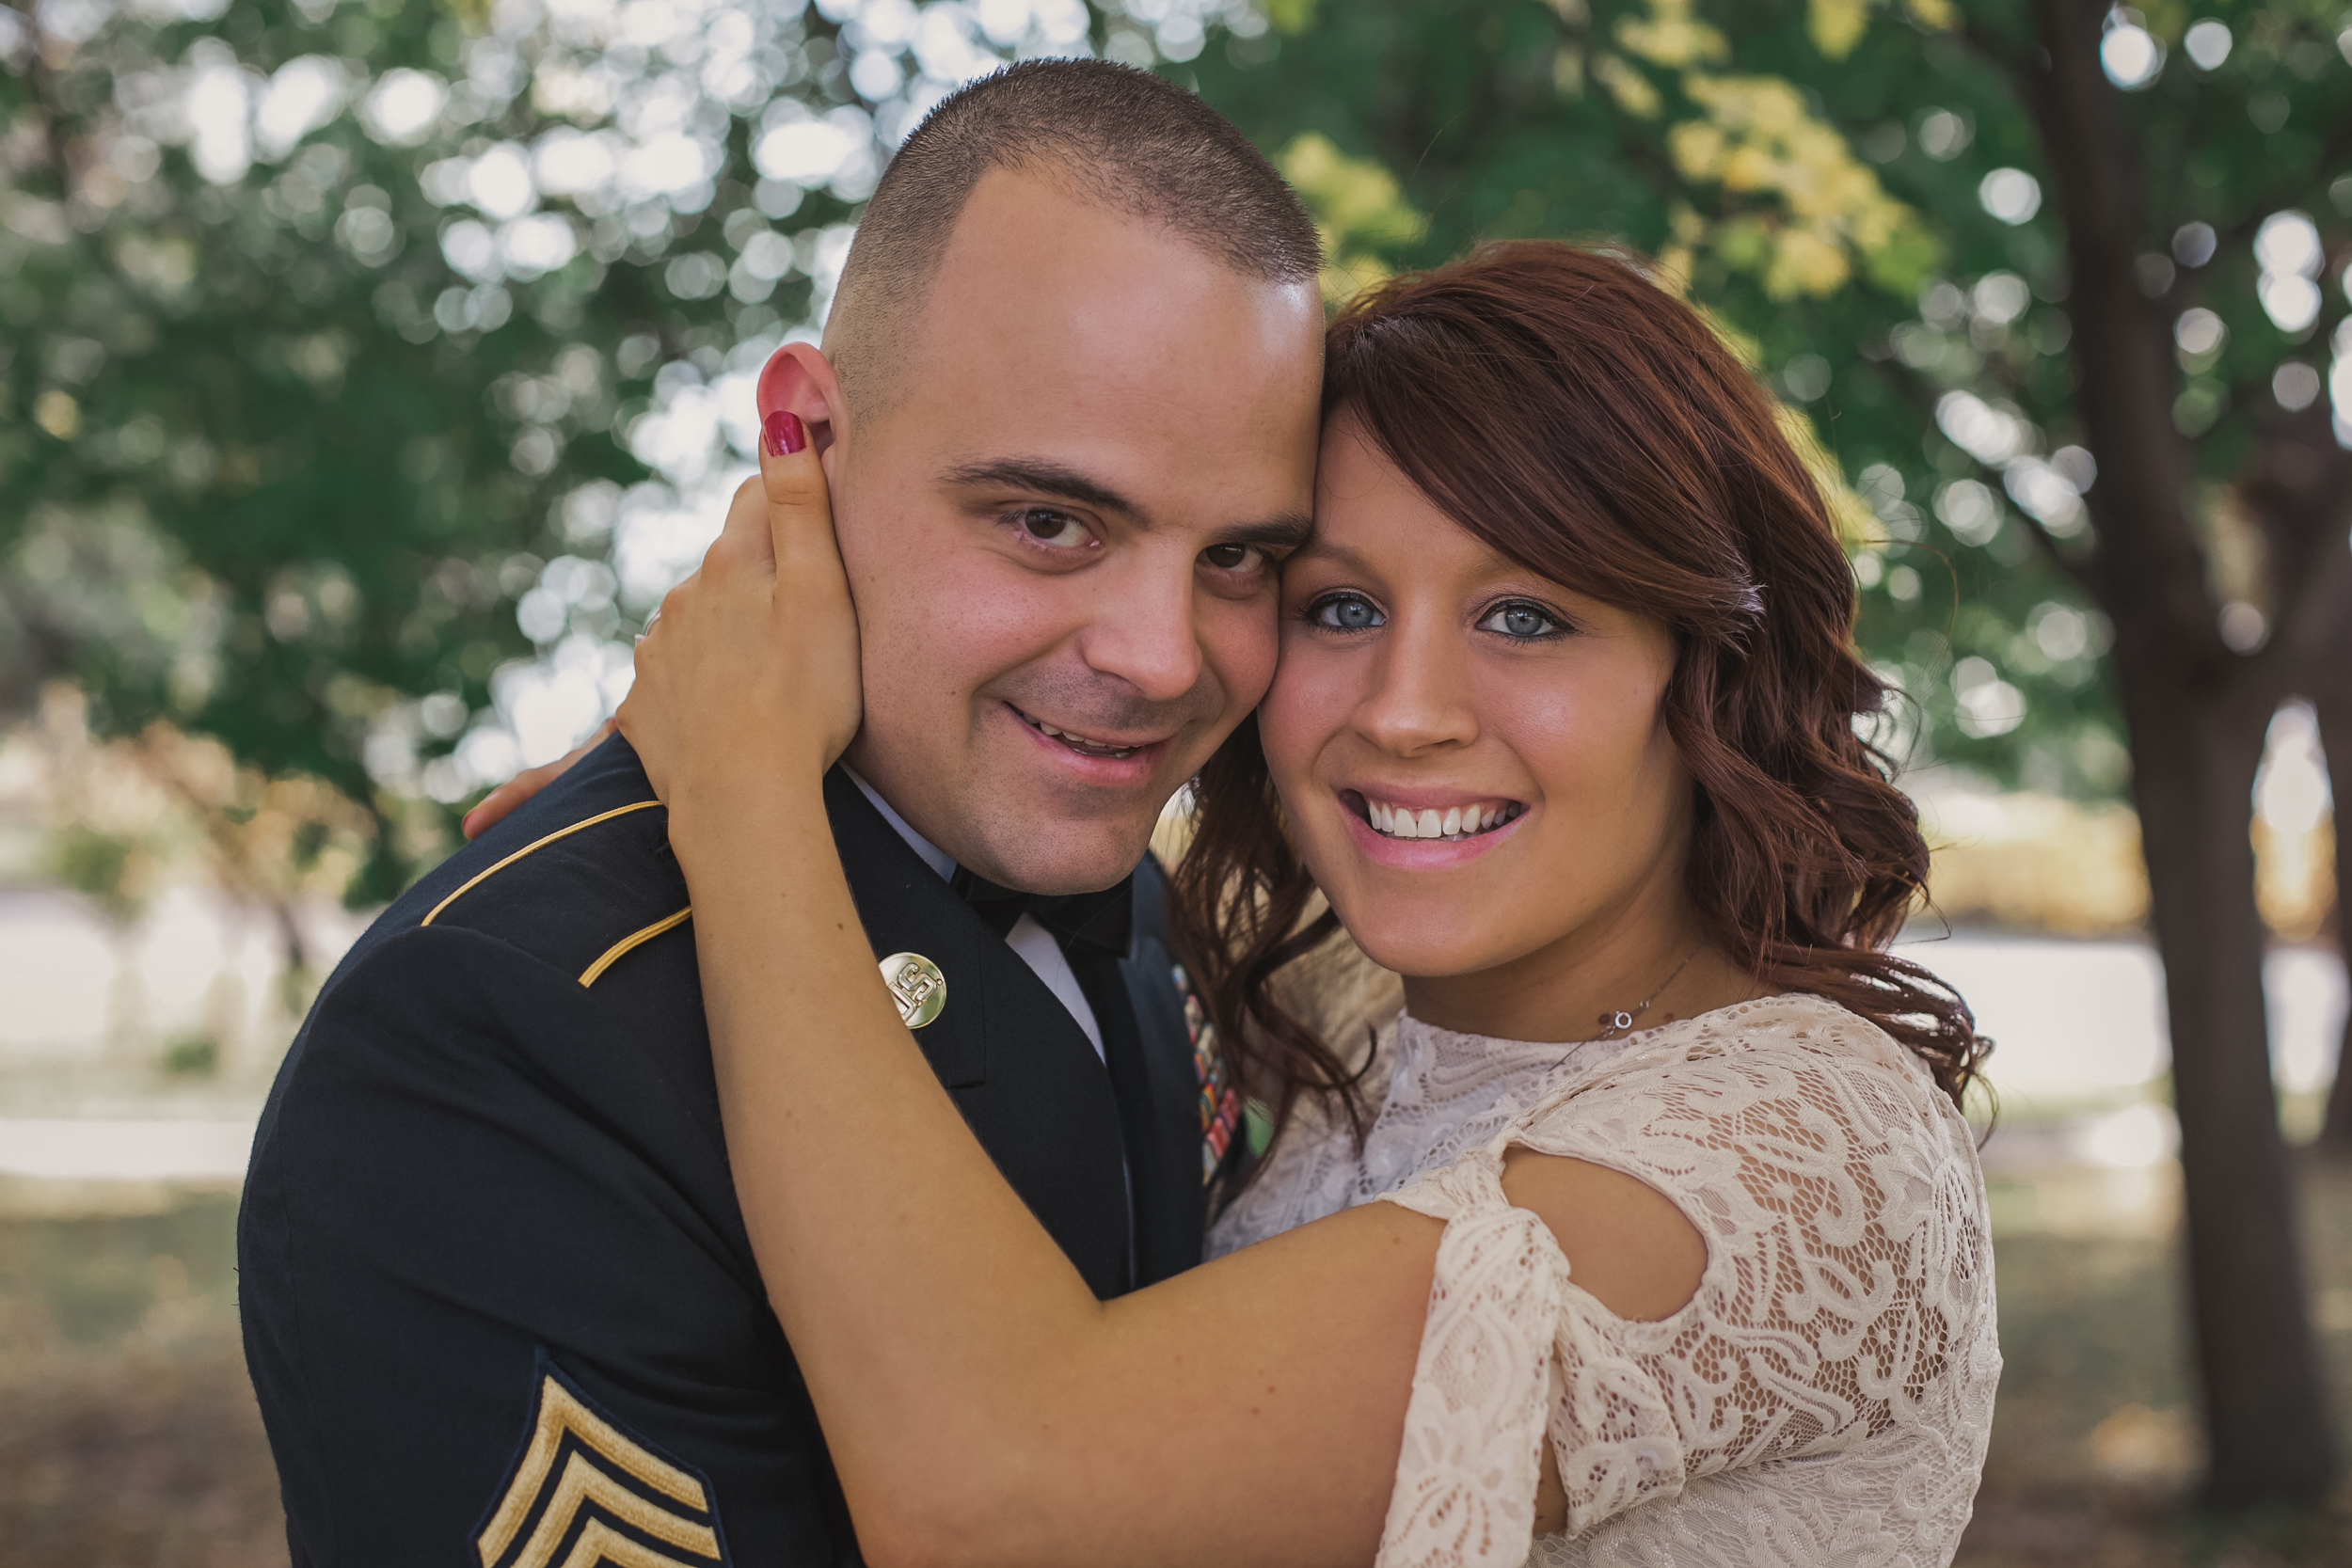 Fort Snelling Elopement St. Paul, MN, Fort Snelling Elopement, Military Elopement, Intimate Military Wedding, intimate elopement wedding-www.rachelsmak.com5.jpg